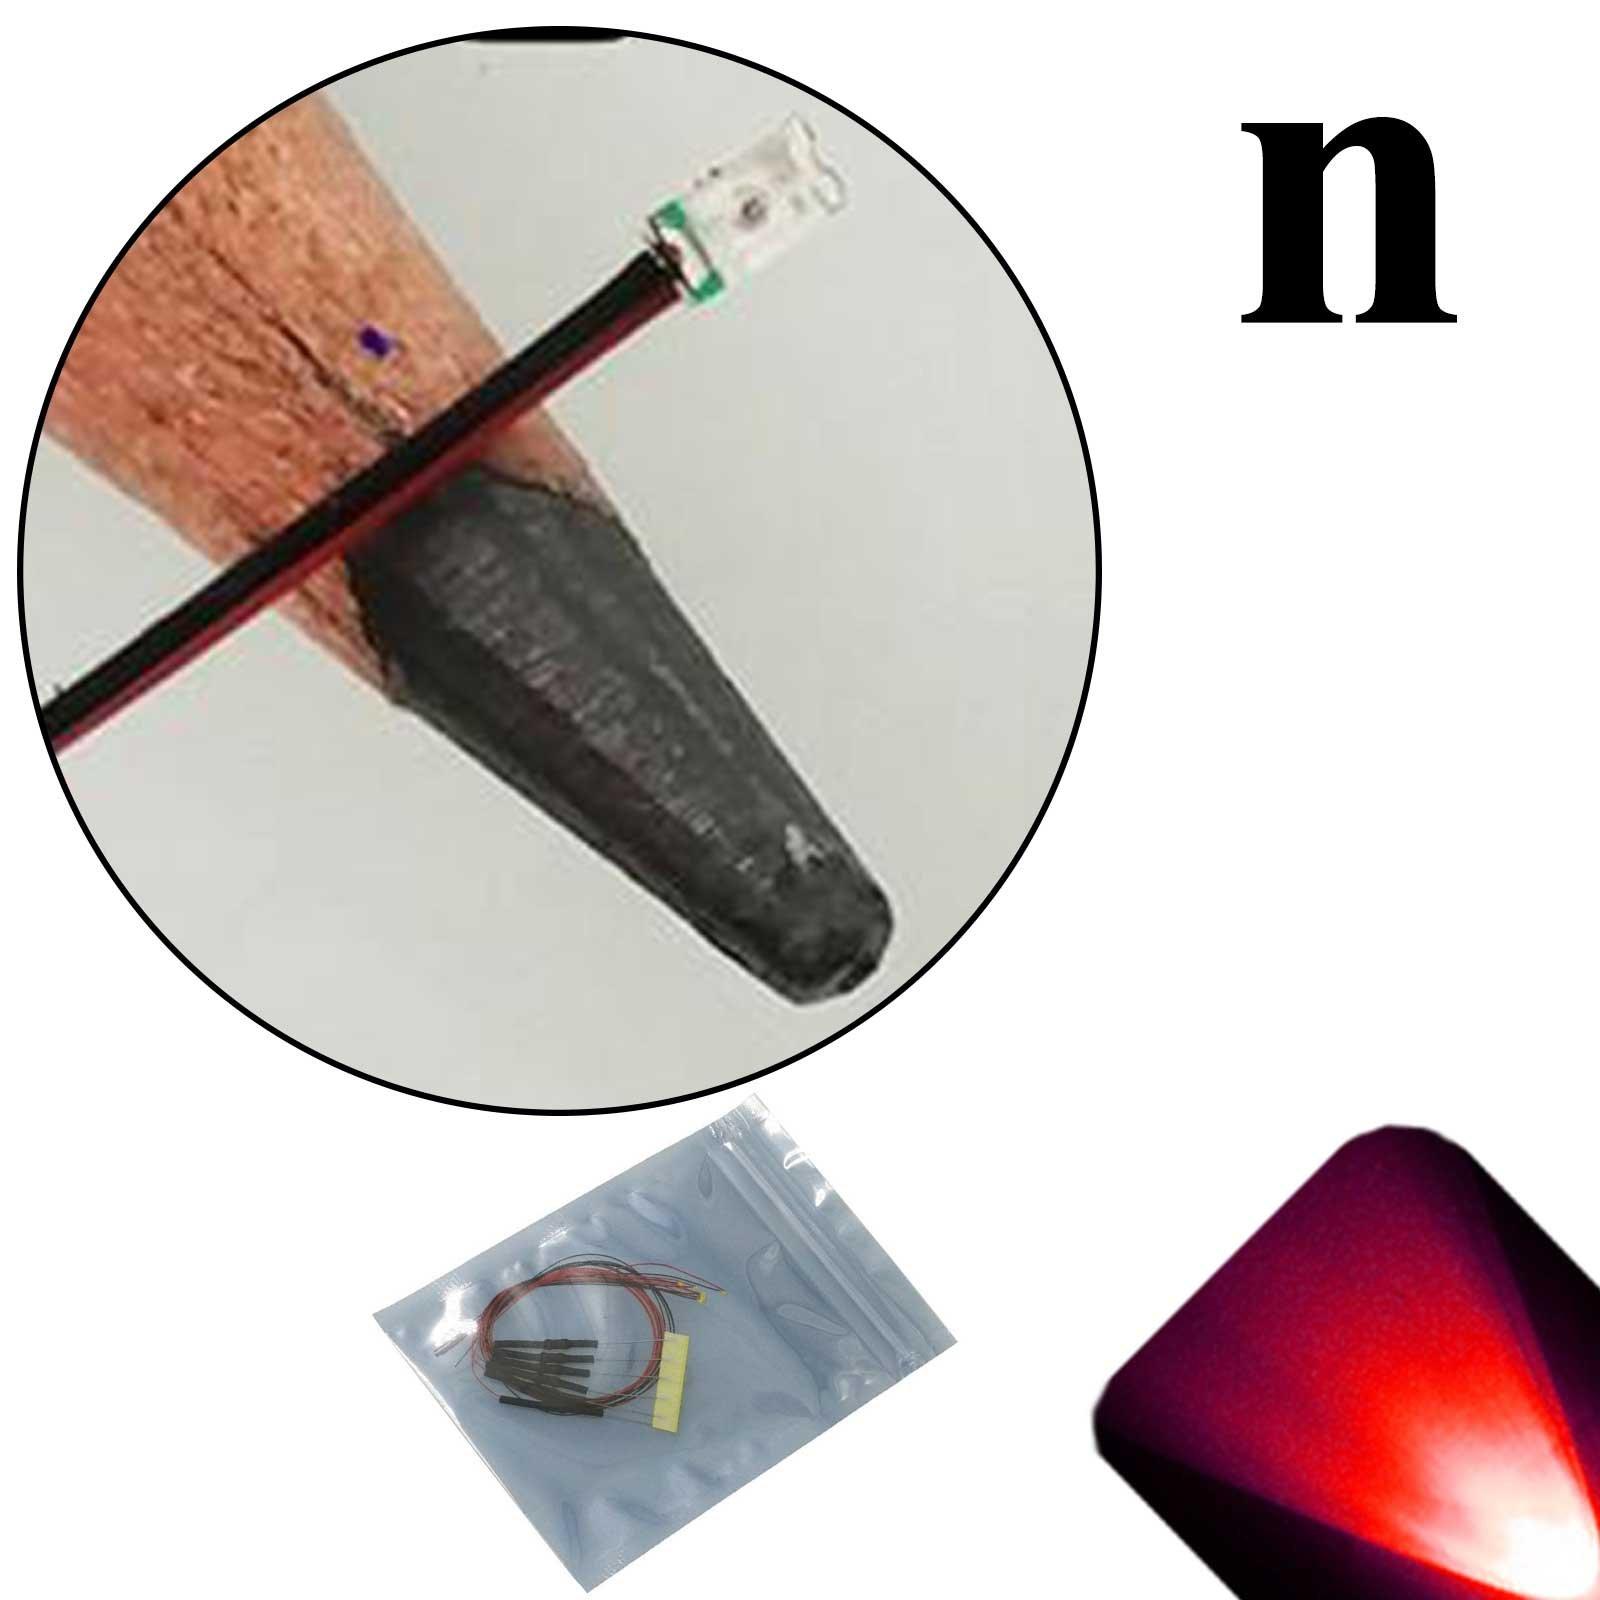 Lighthouse LEDs 12v 0603 Nano SMD Wide Angle Pre-Wired Red LED - Ultra Bright (10v, 11v, 12v, 13v, 14v, 15v, 16v, 17v, 18v) (Pack of 20)